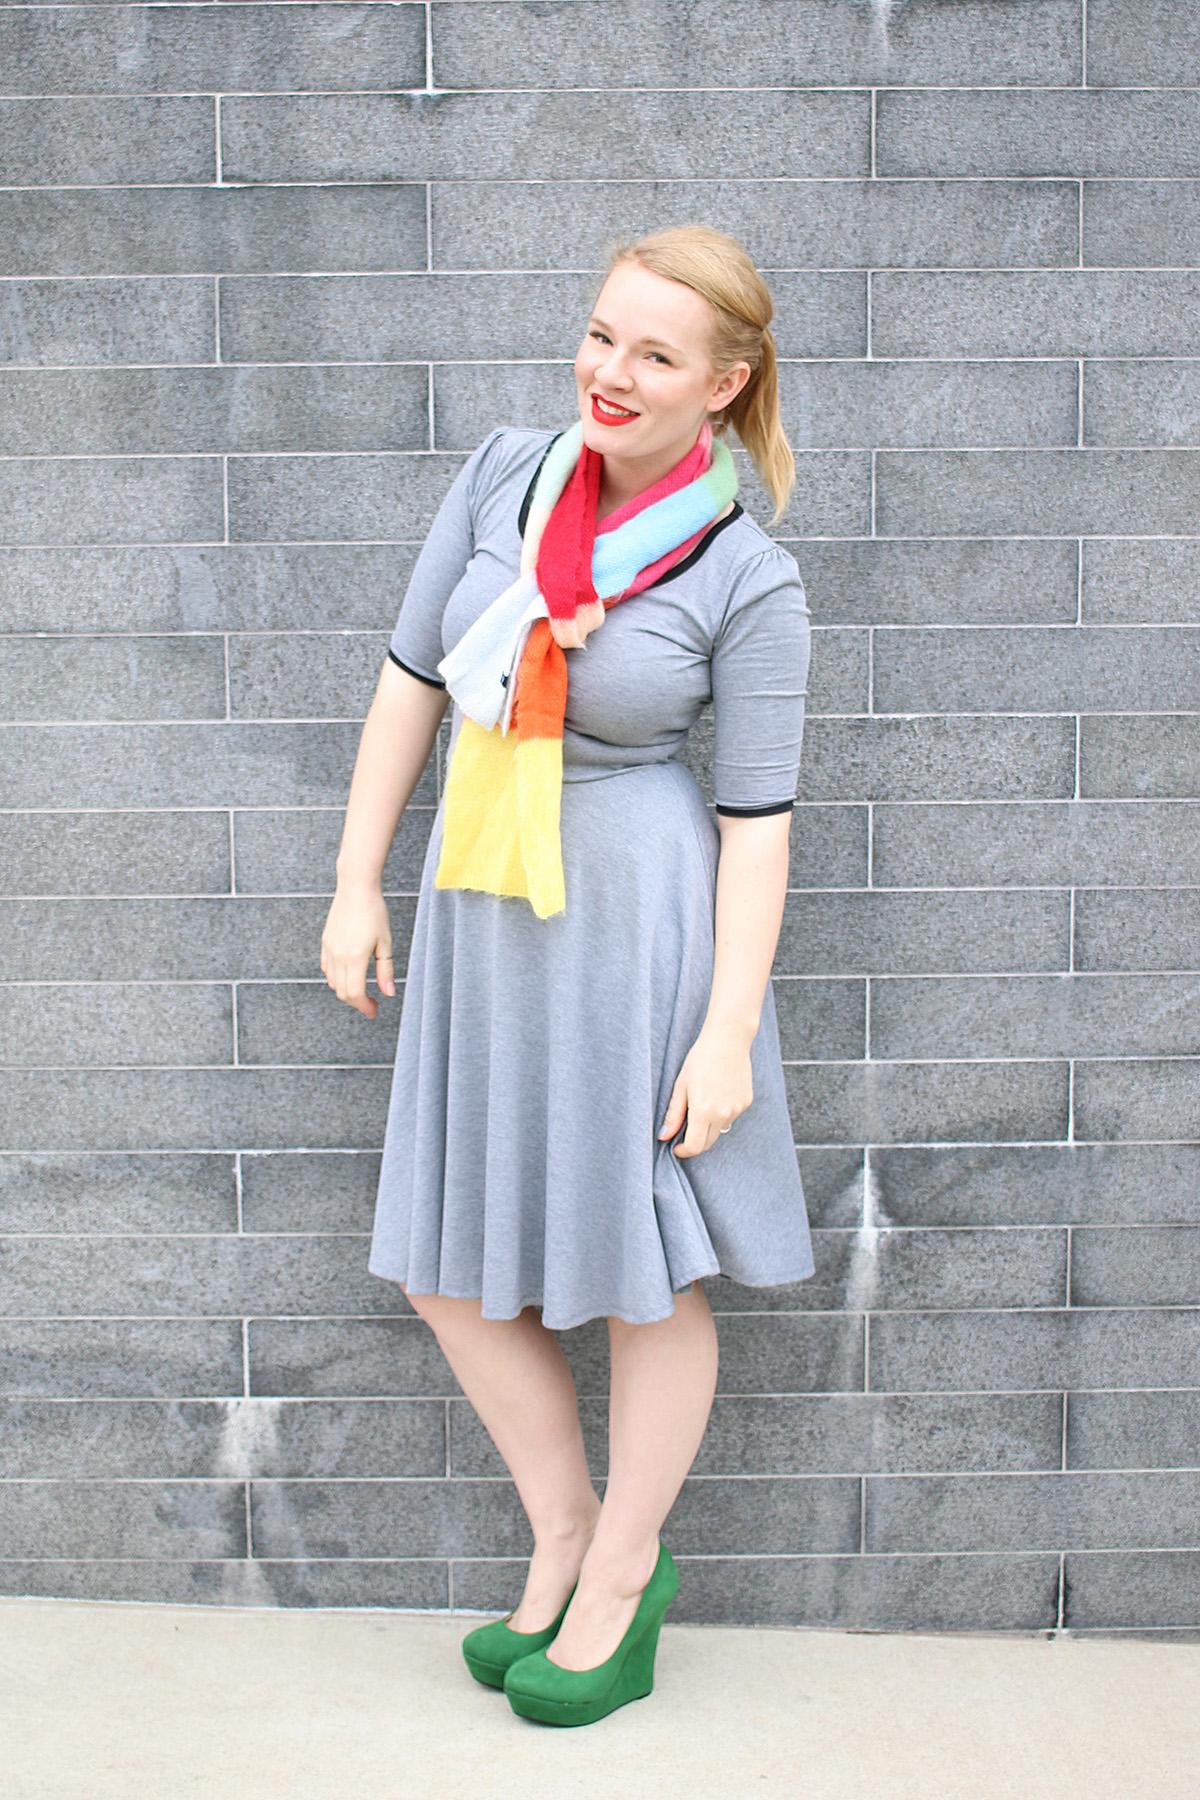 LuLaRoe Nicole Dress Styling